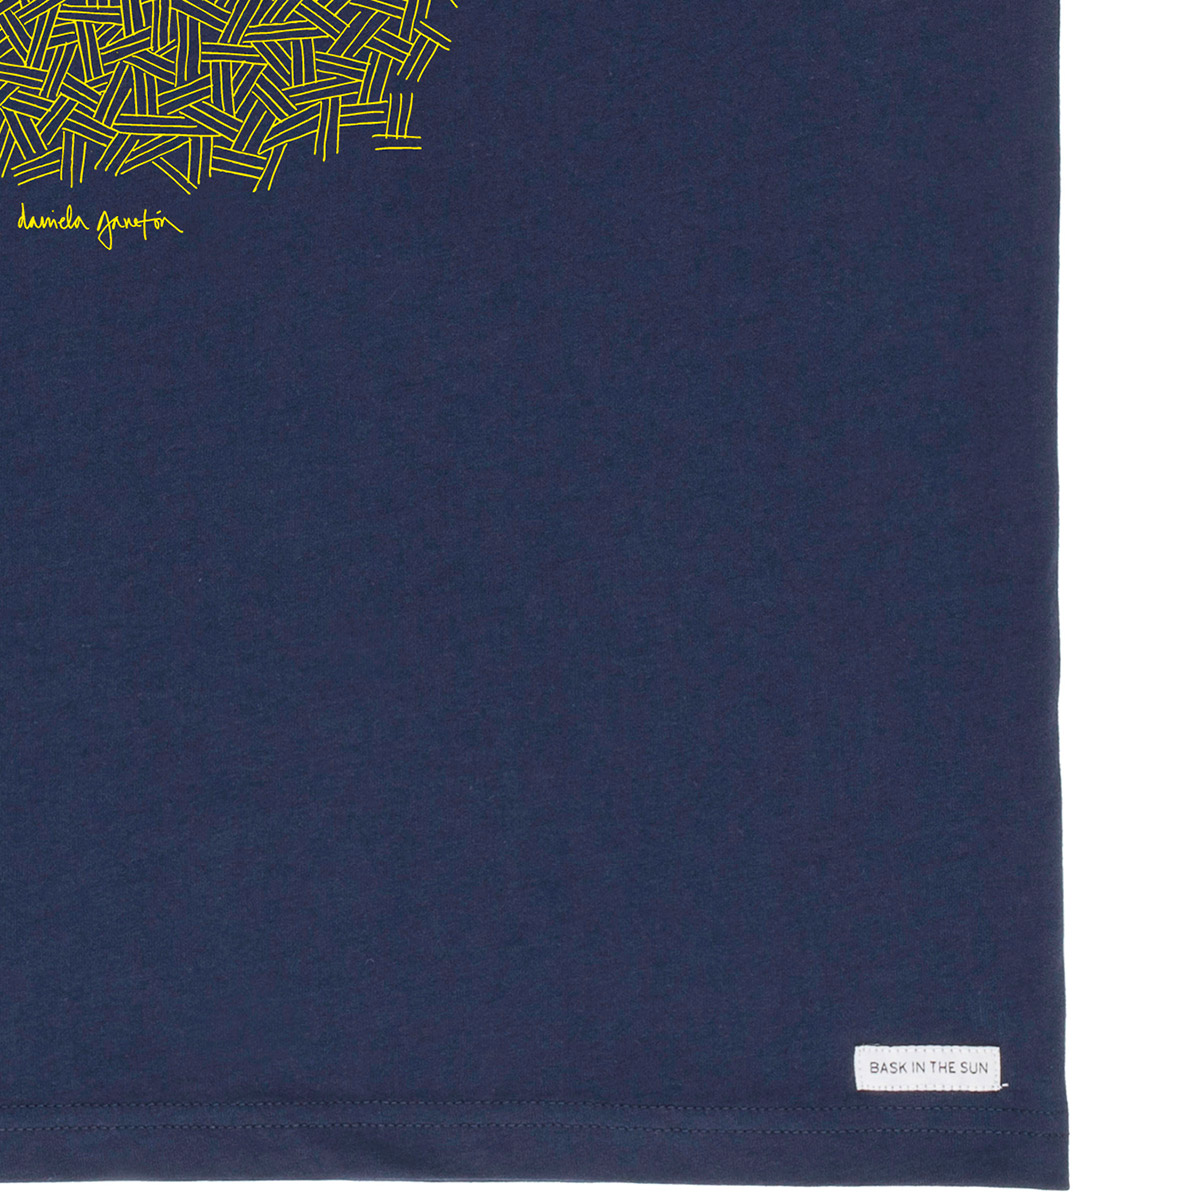 T-shirt en coton bio navy smoking pipe - Bask in the Sun num 3